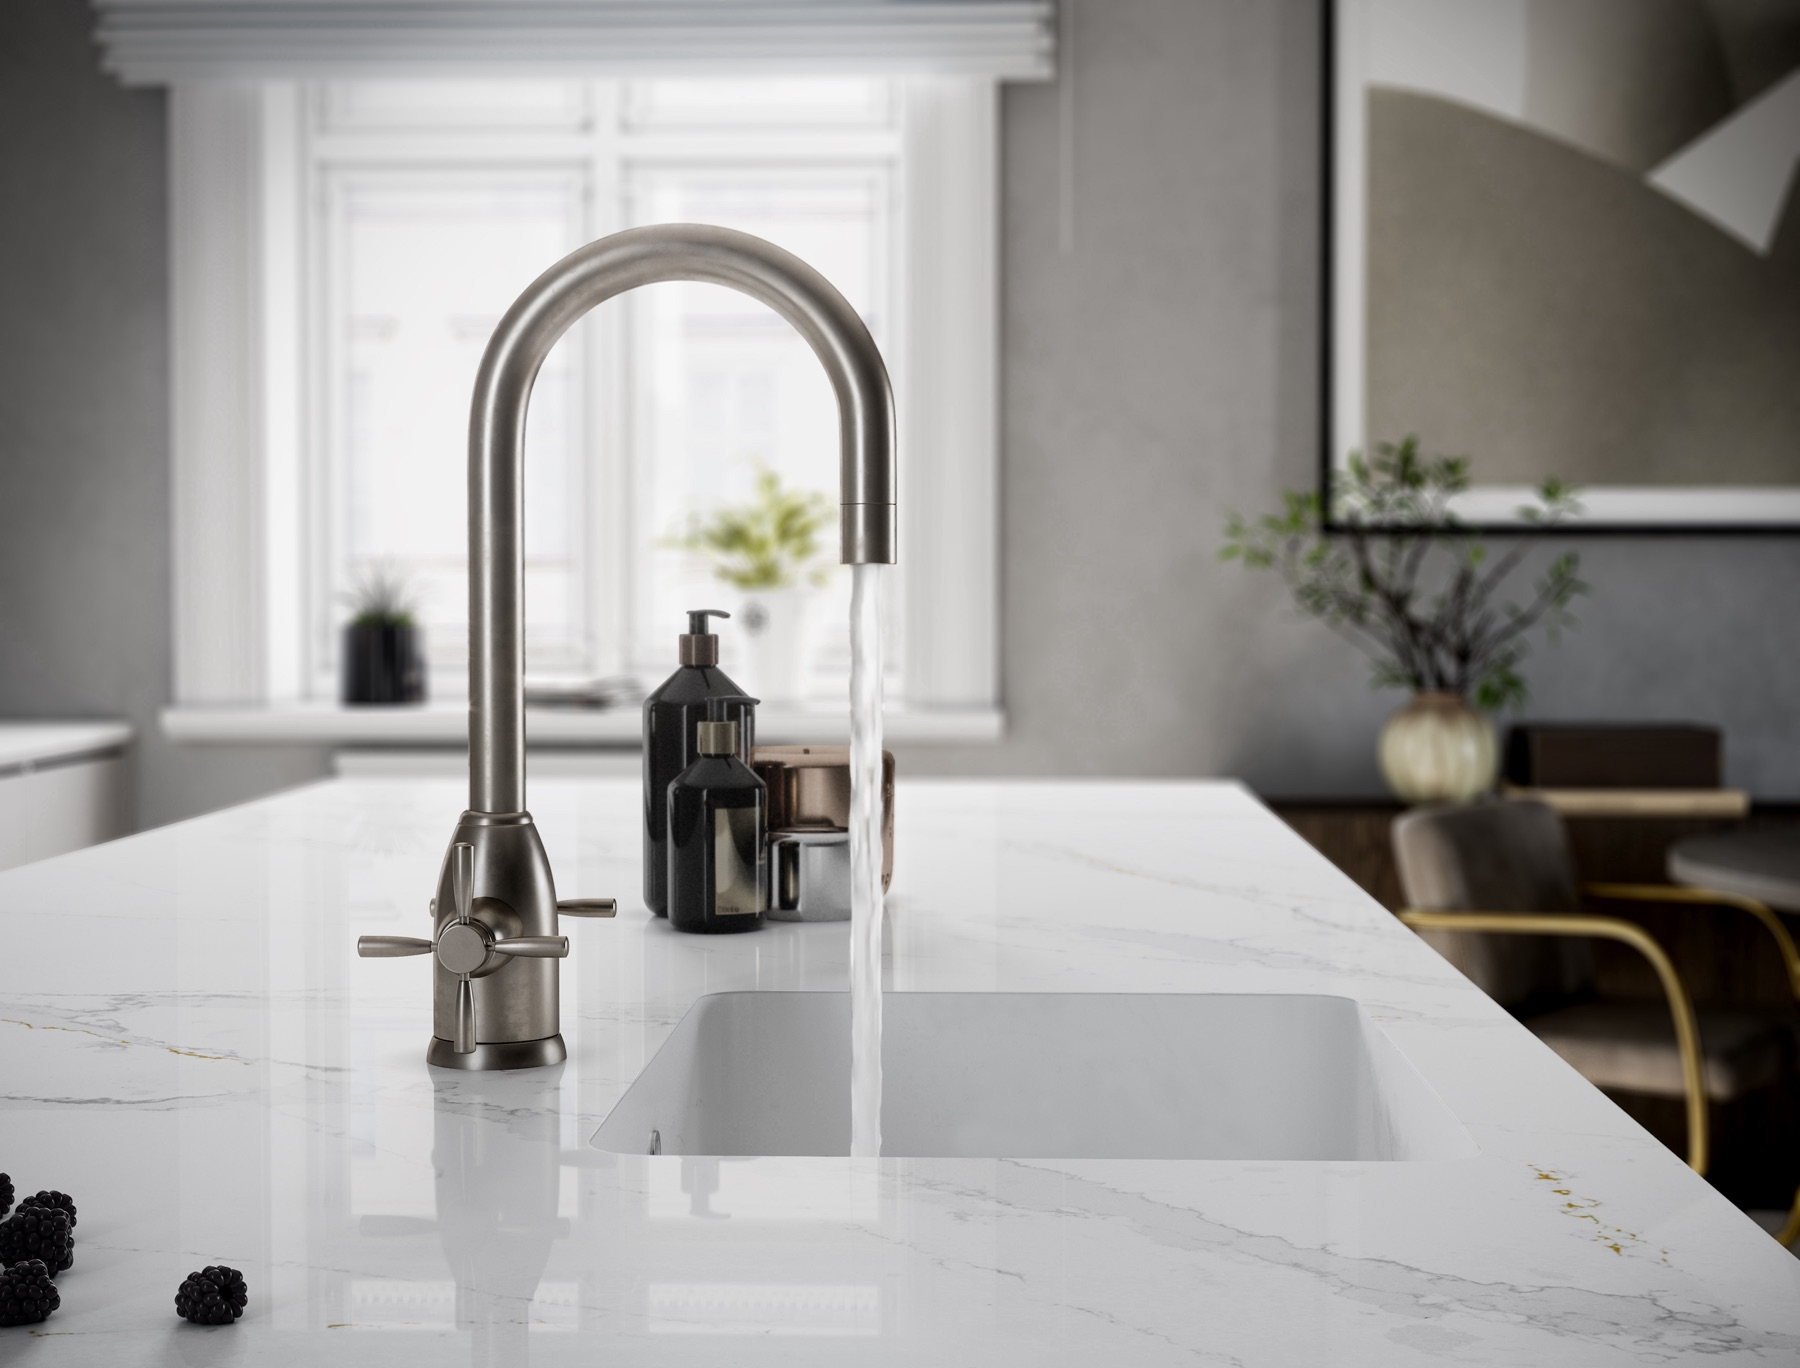 Plan-travail-cuisine-evierr-incruste-marbrerie-silestone-STC-Paris